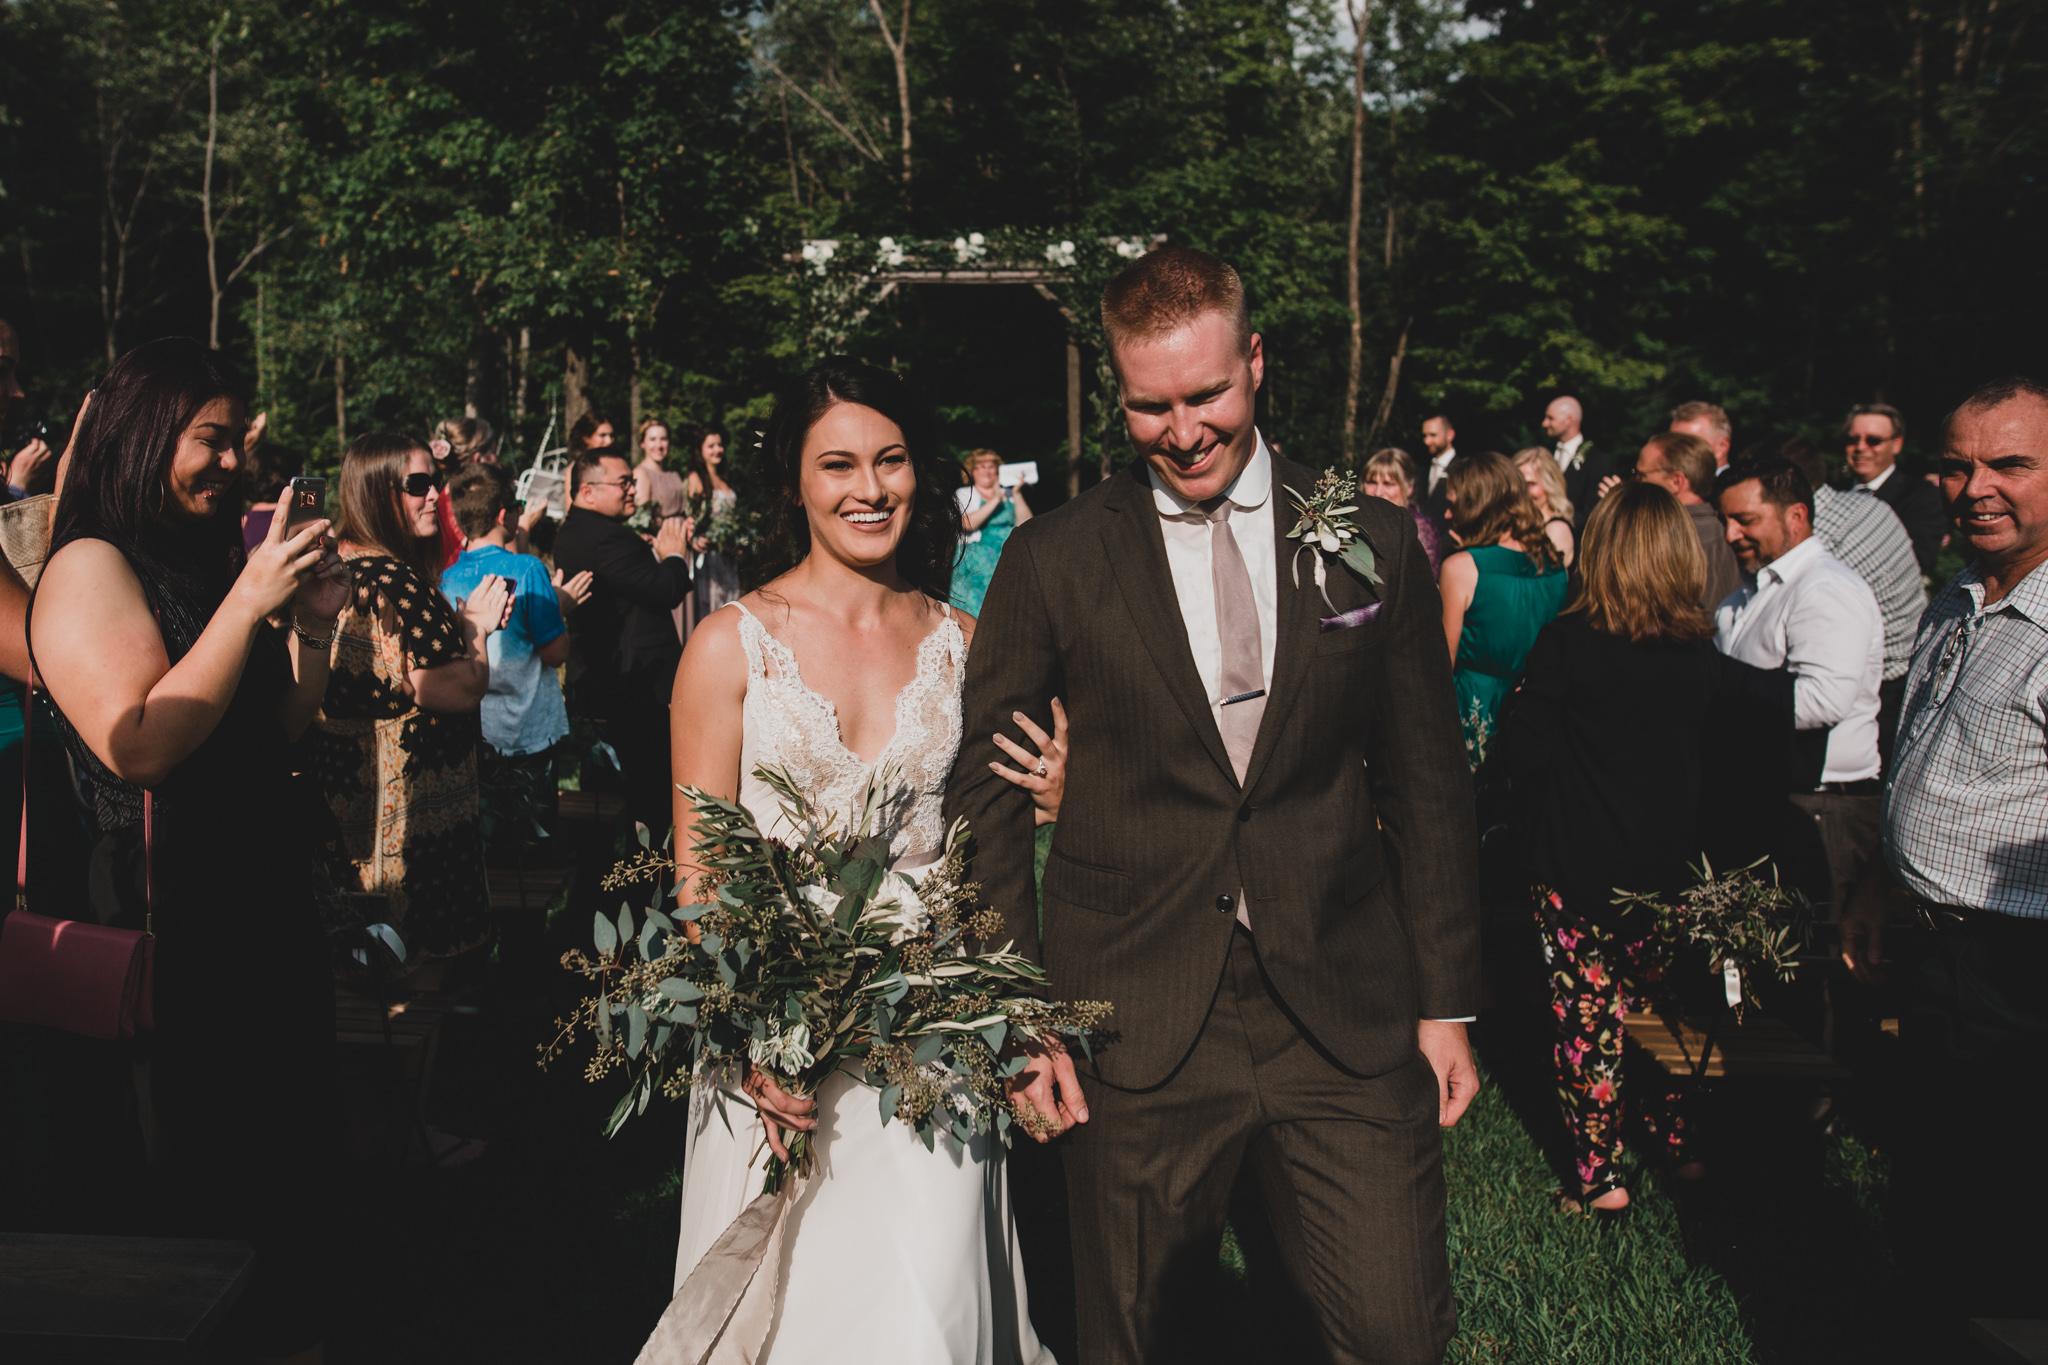 Ottawa and Gatinea, Outdoor Wedding Ceremony Venues